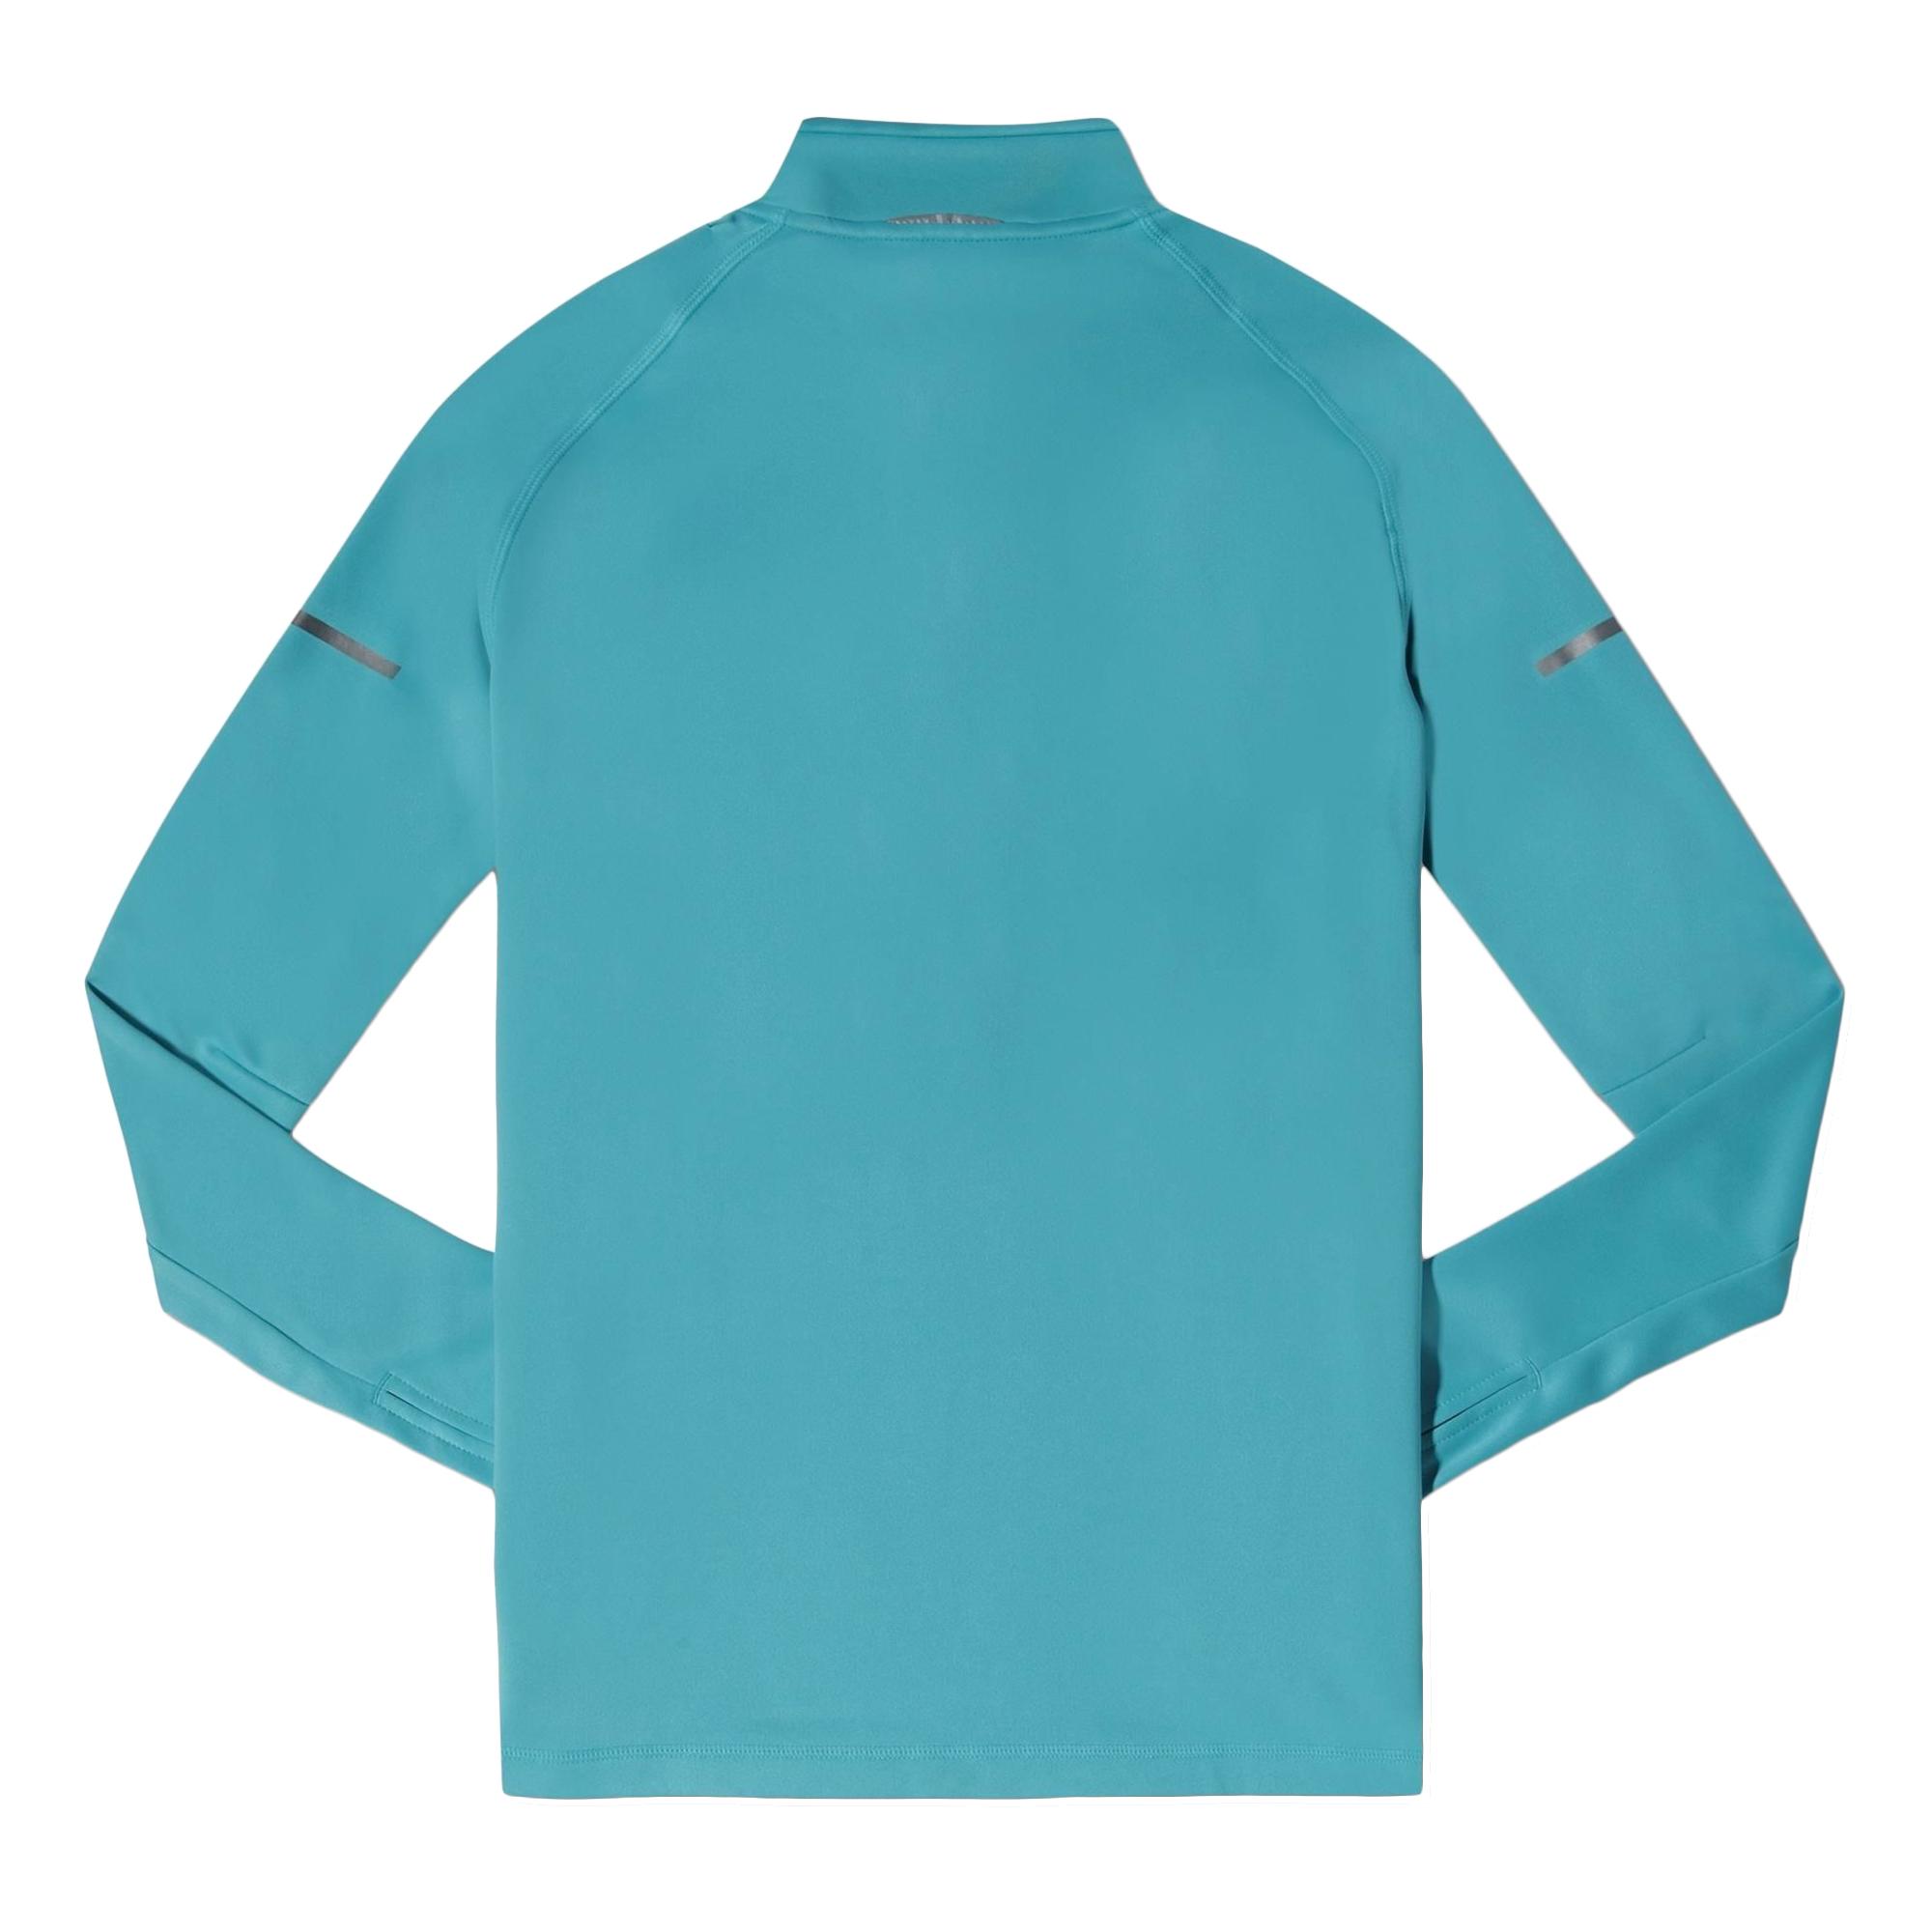 Adidas sequencials climacool 1 2 zip long sleeve running for Long sleeve running shirt womens